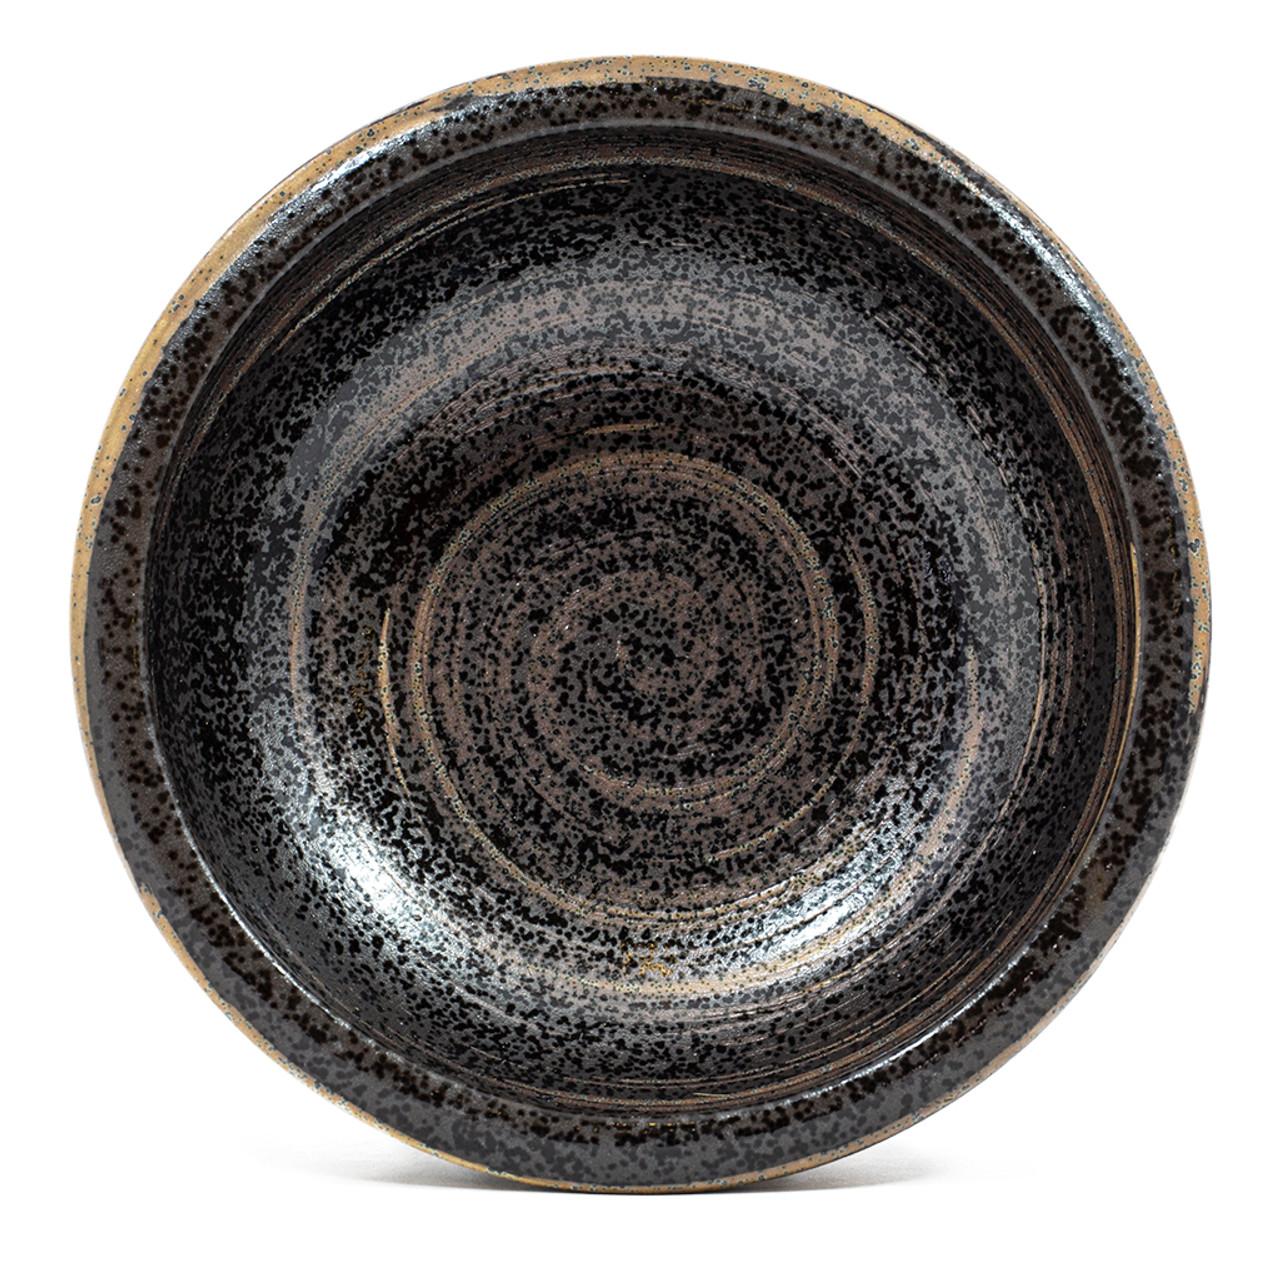 Shifuku Bowl - Black